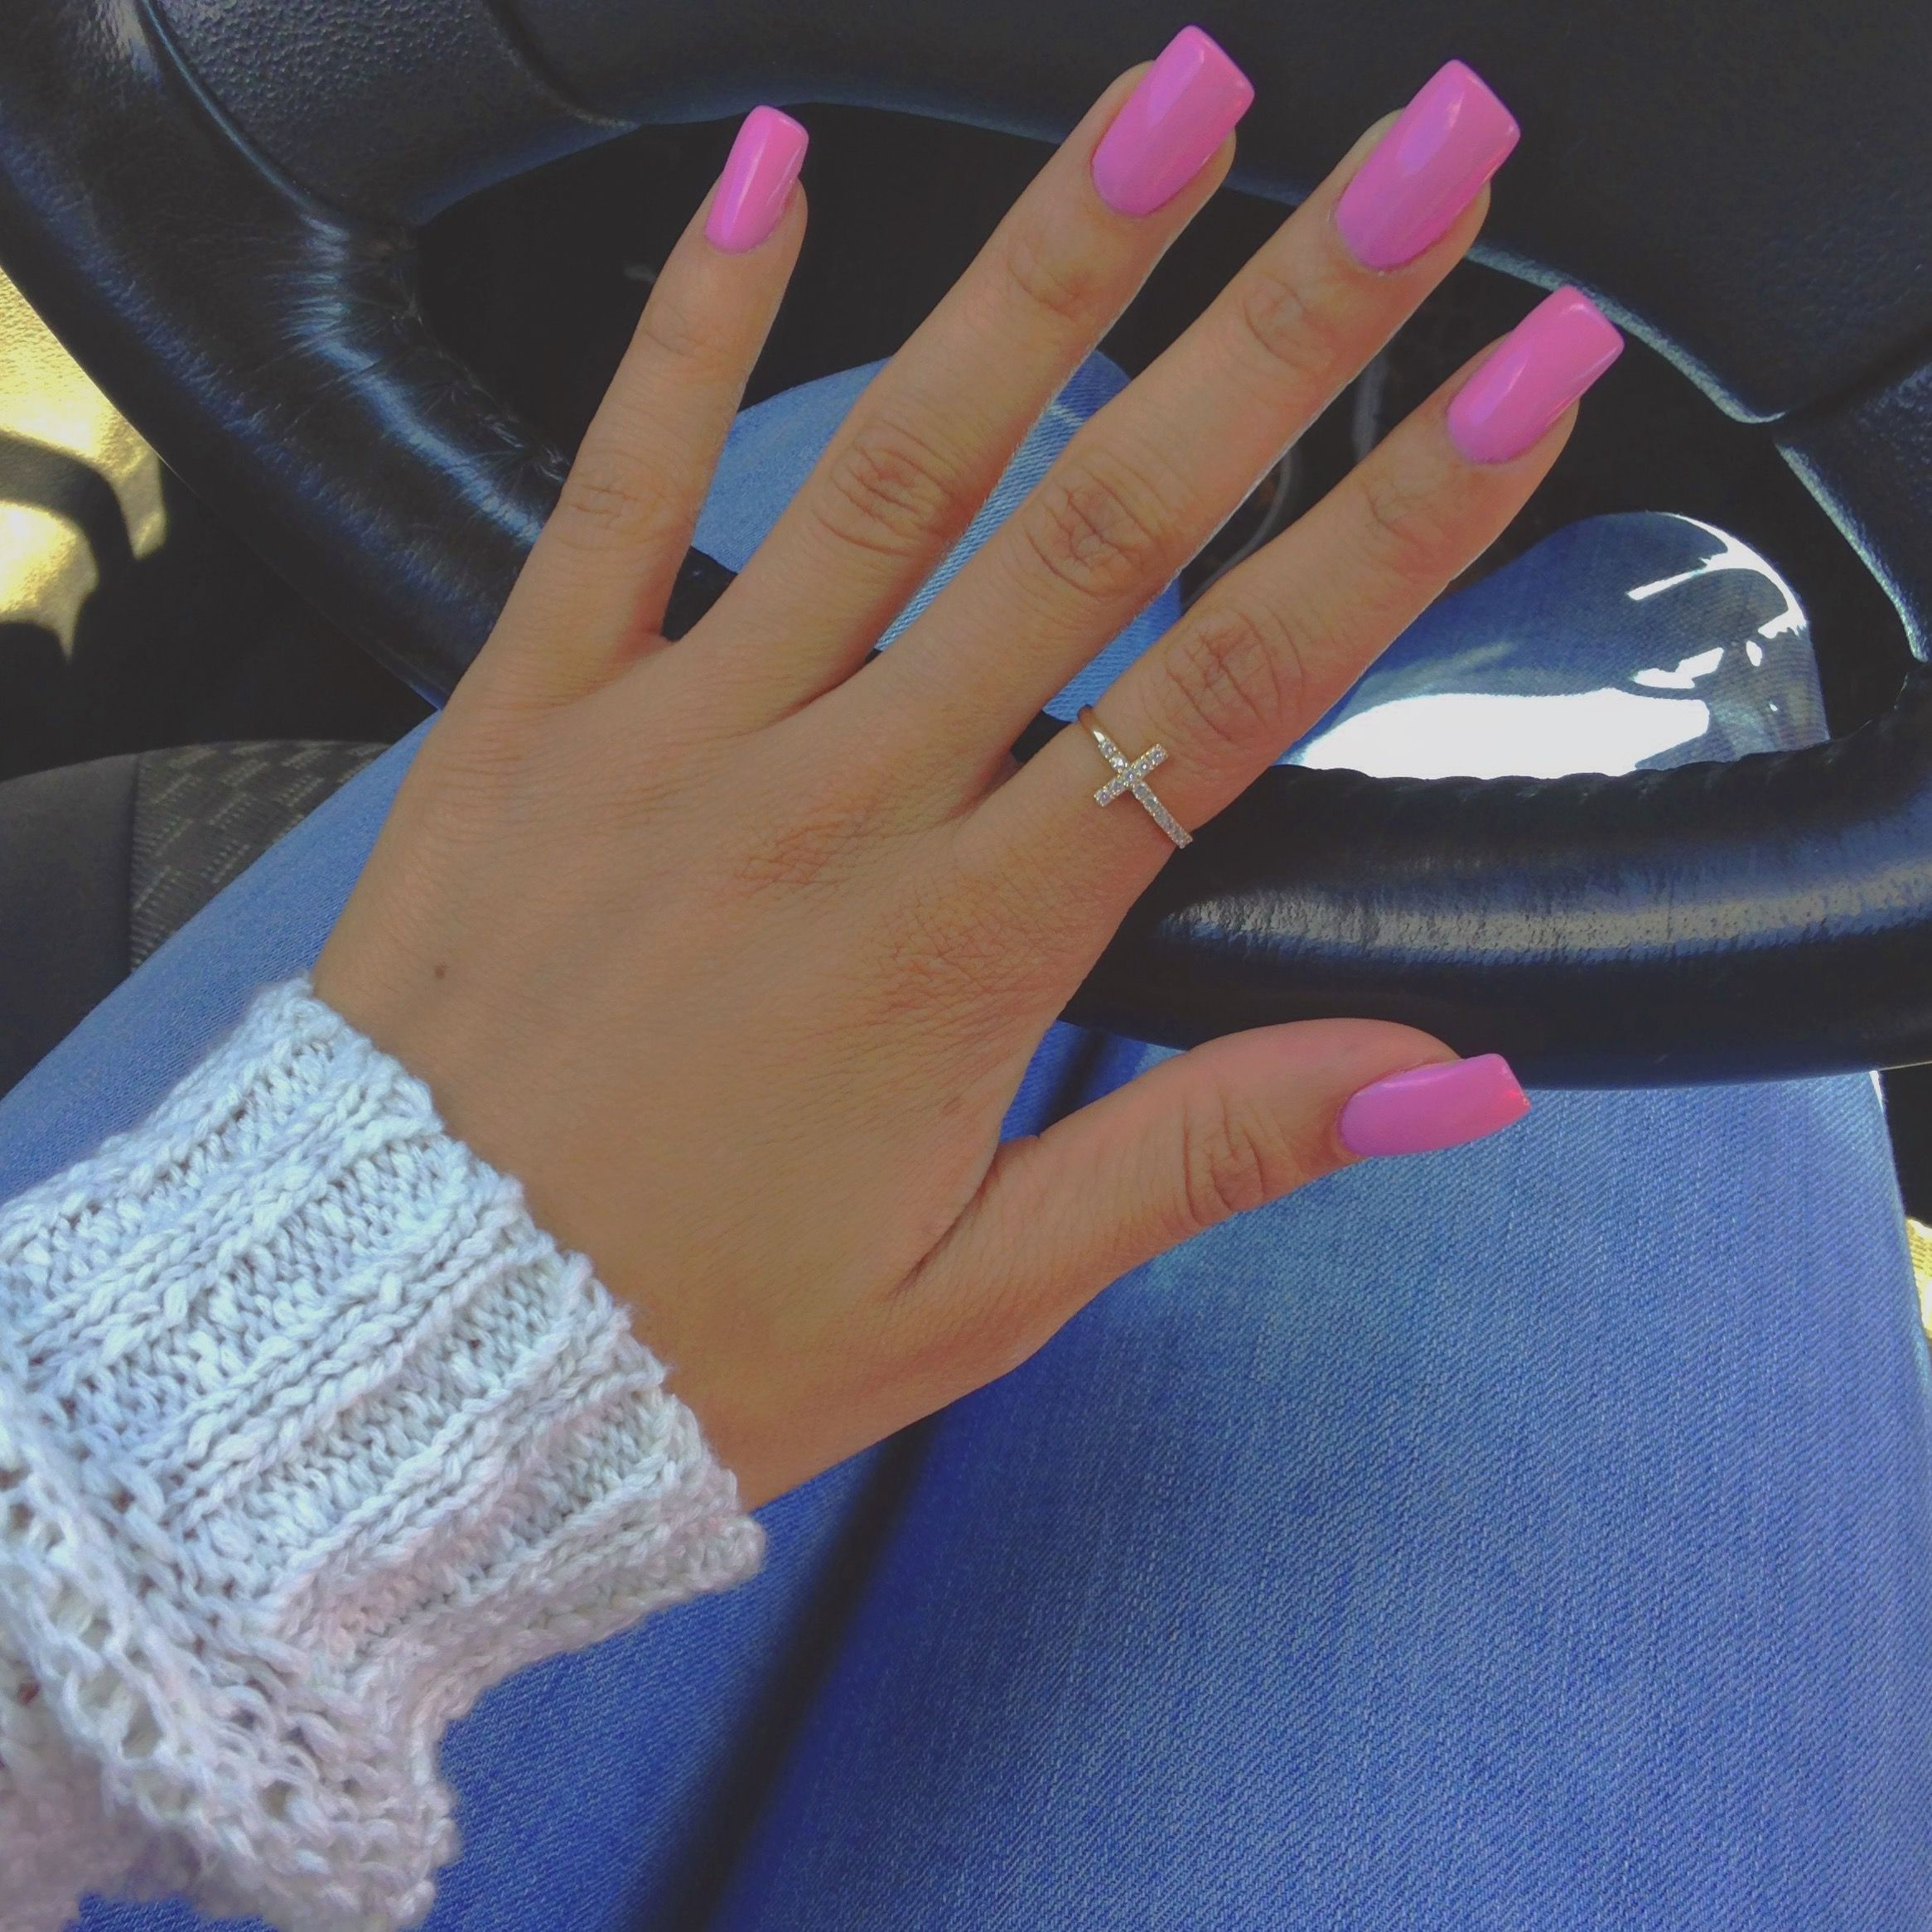 Beautiful Barbie Pink Acrylic Nails Princessaaronashley Barbie Pink Nails Pink Acrylic Nails Bright Pink Nails